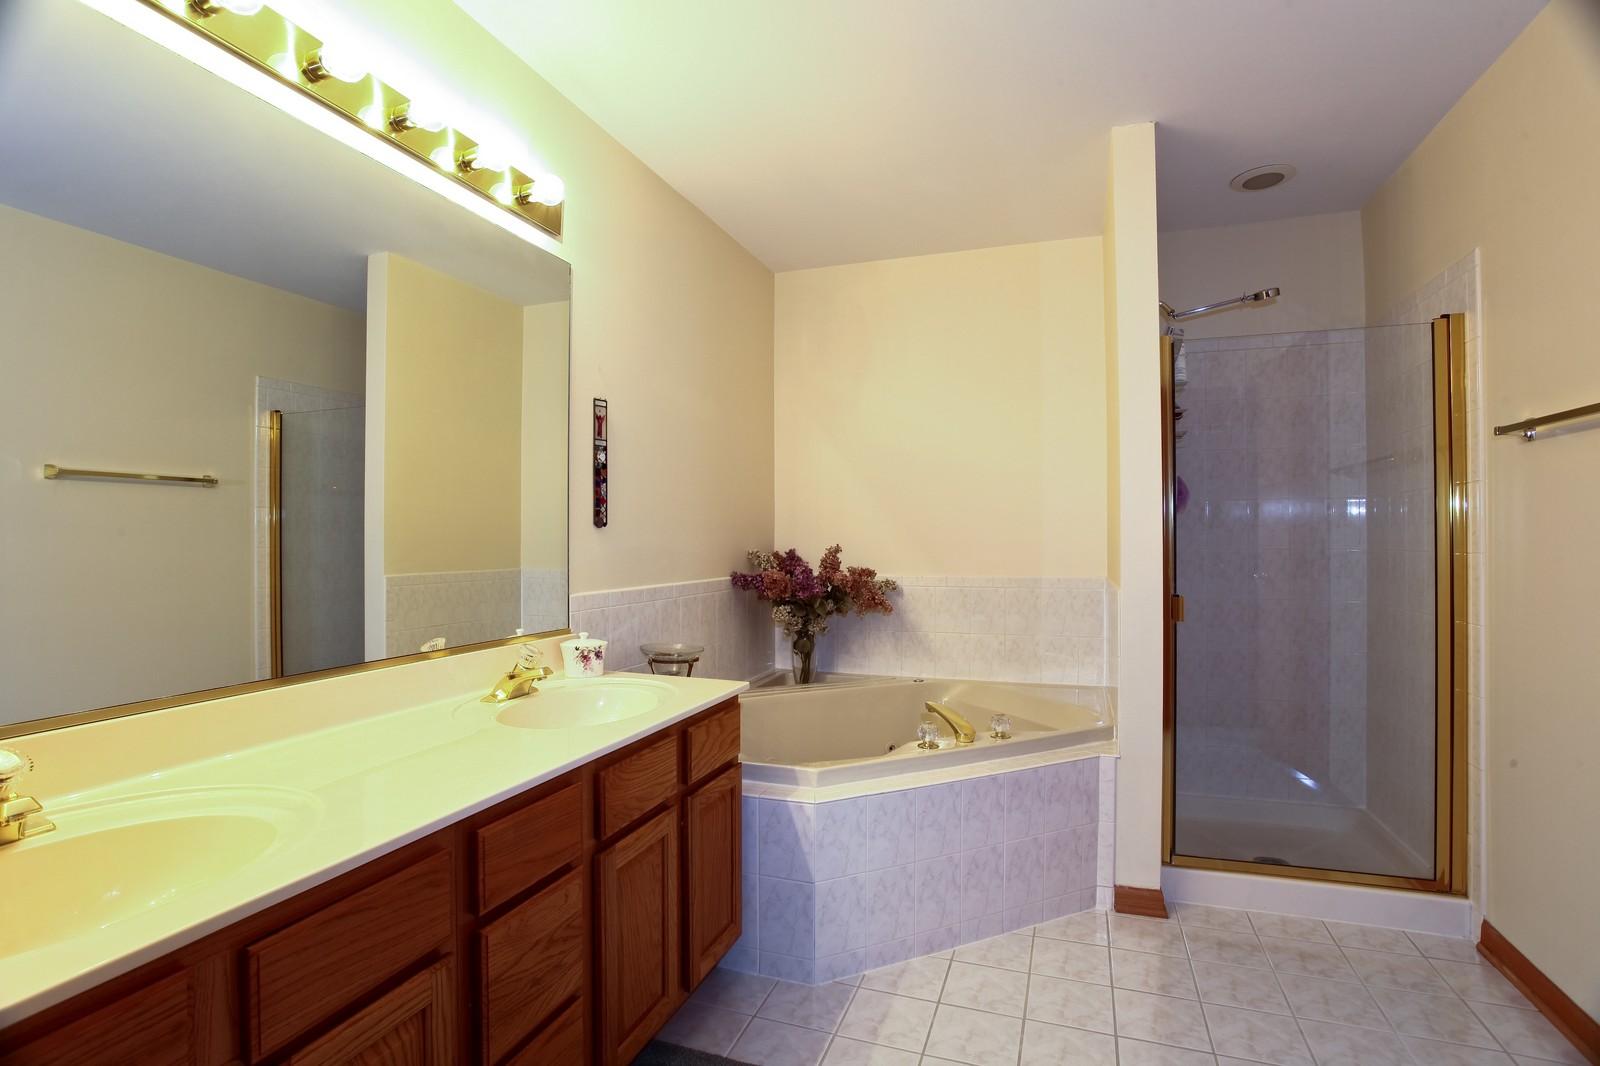 Real Estate Photography - 860 McKenzie Station Dr, Lisle, IL, 60532 - Master Bathroom